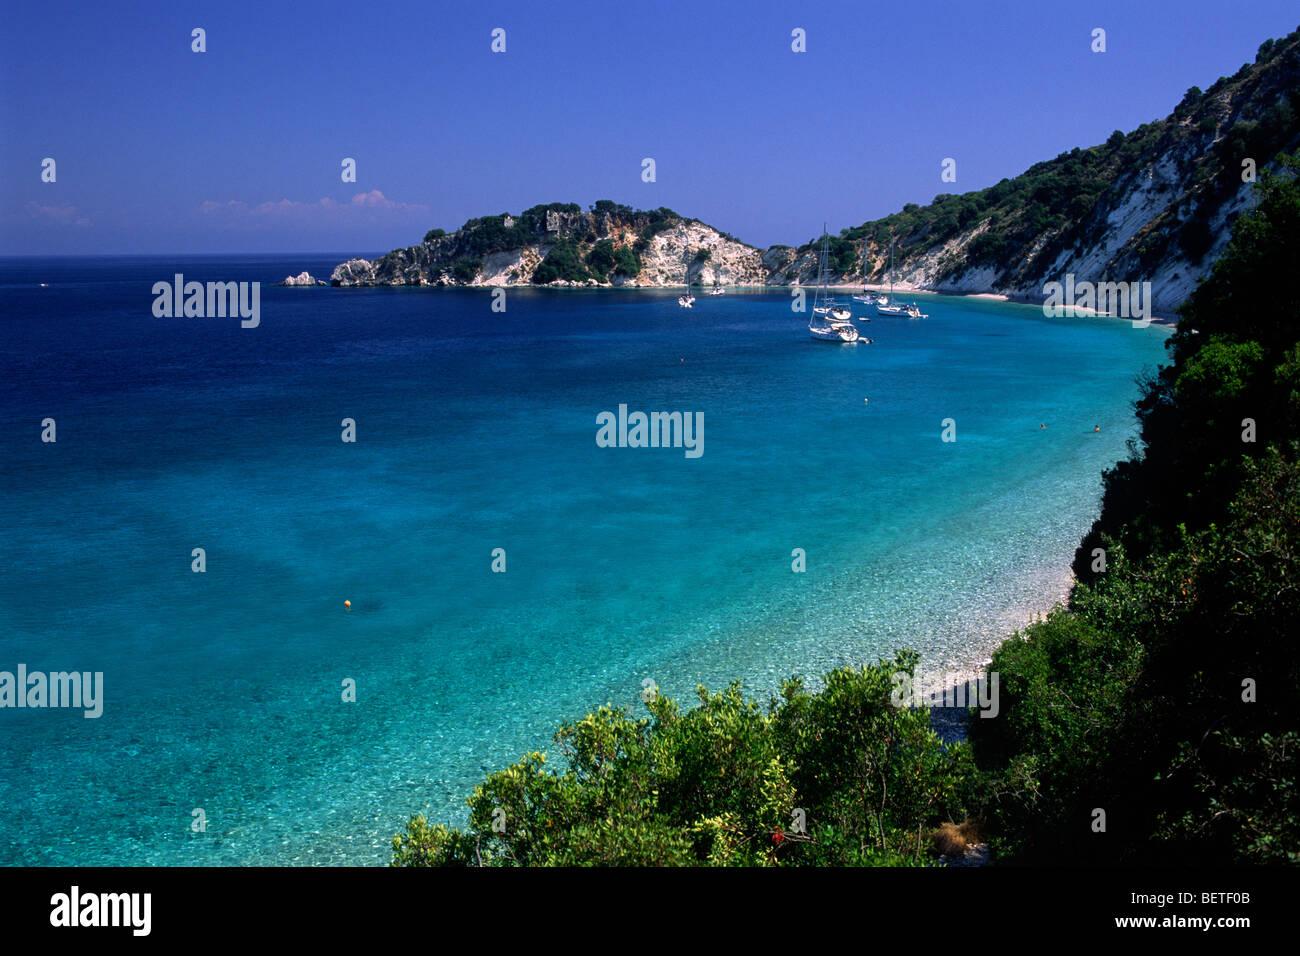 greece, ionian islands, ithaca, gidaki beach - Stock Image